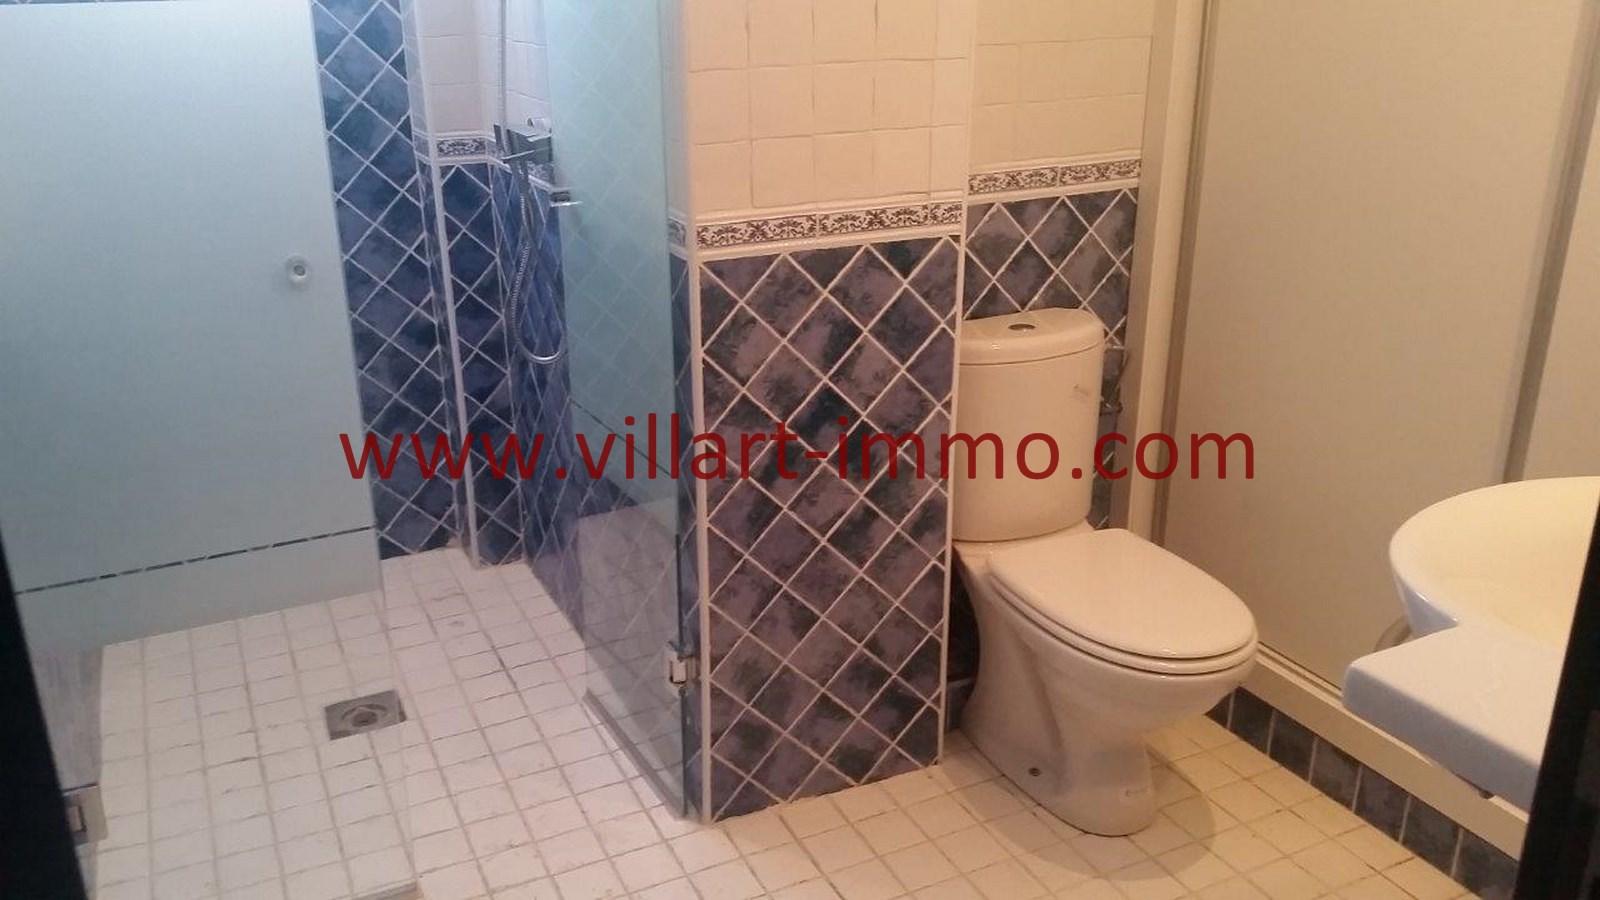 9-a-louer-appartement-meuble-centre-ville-tanger-salle-de-bain-2-l964-villart-immo